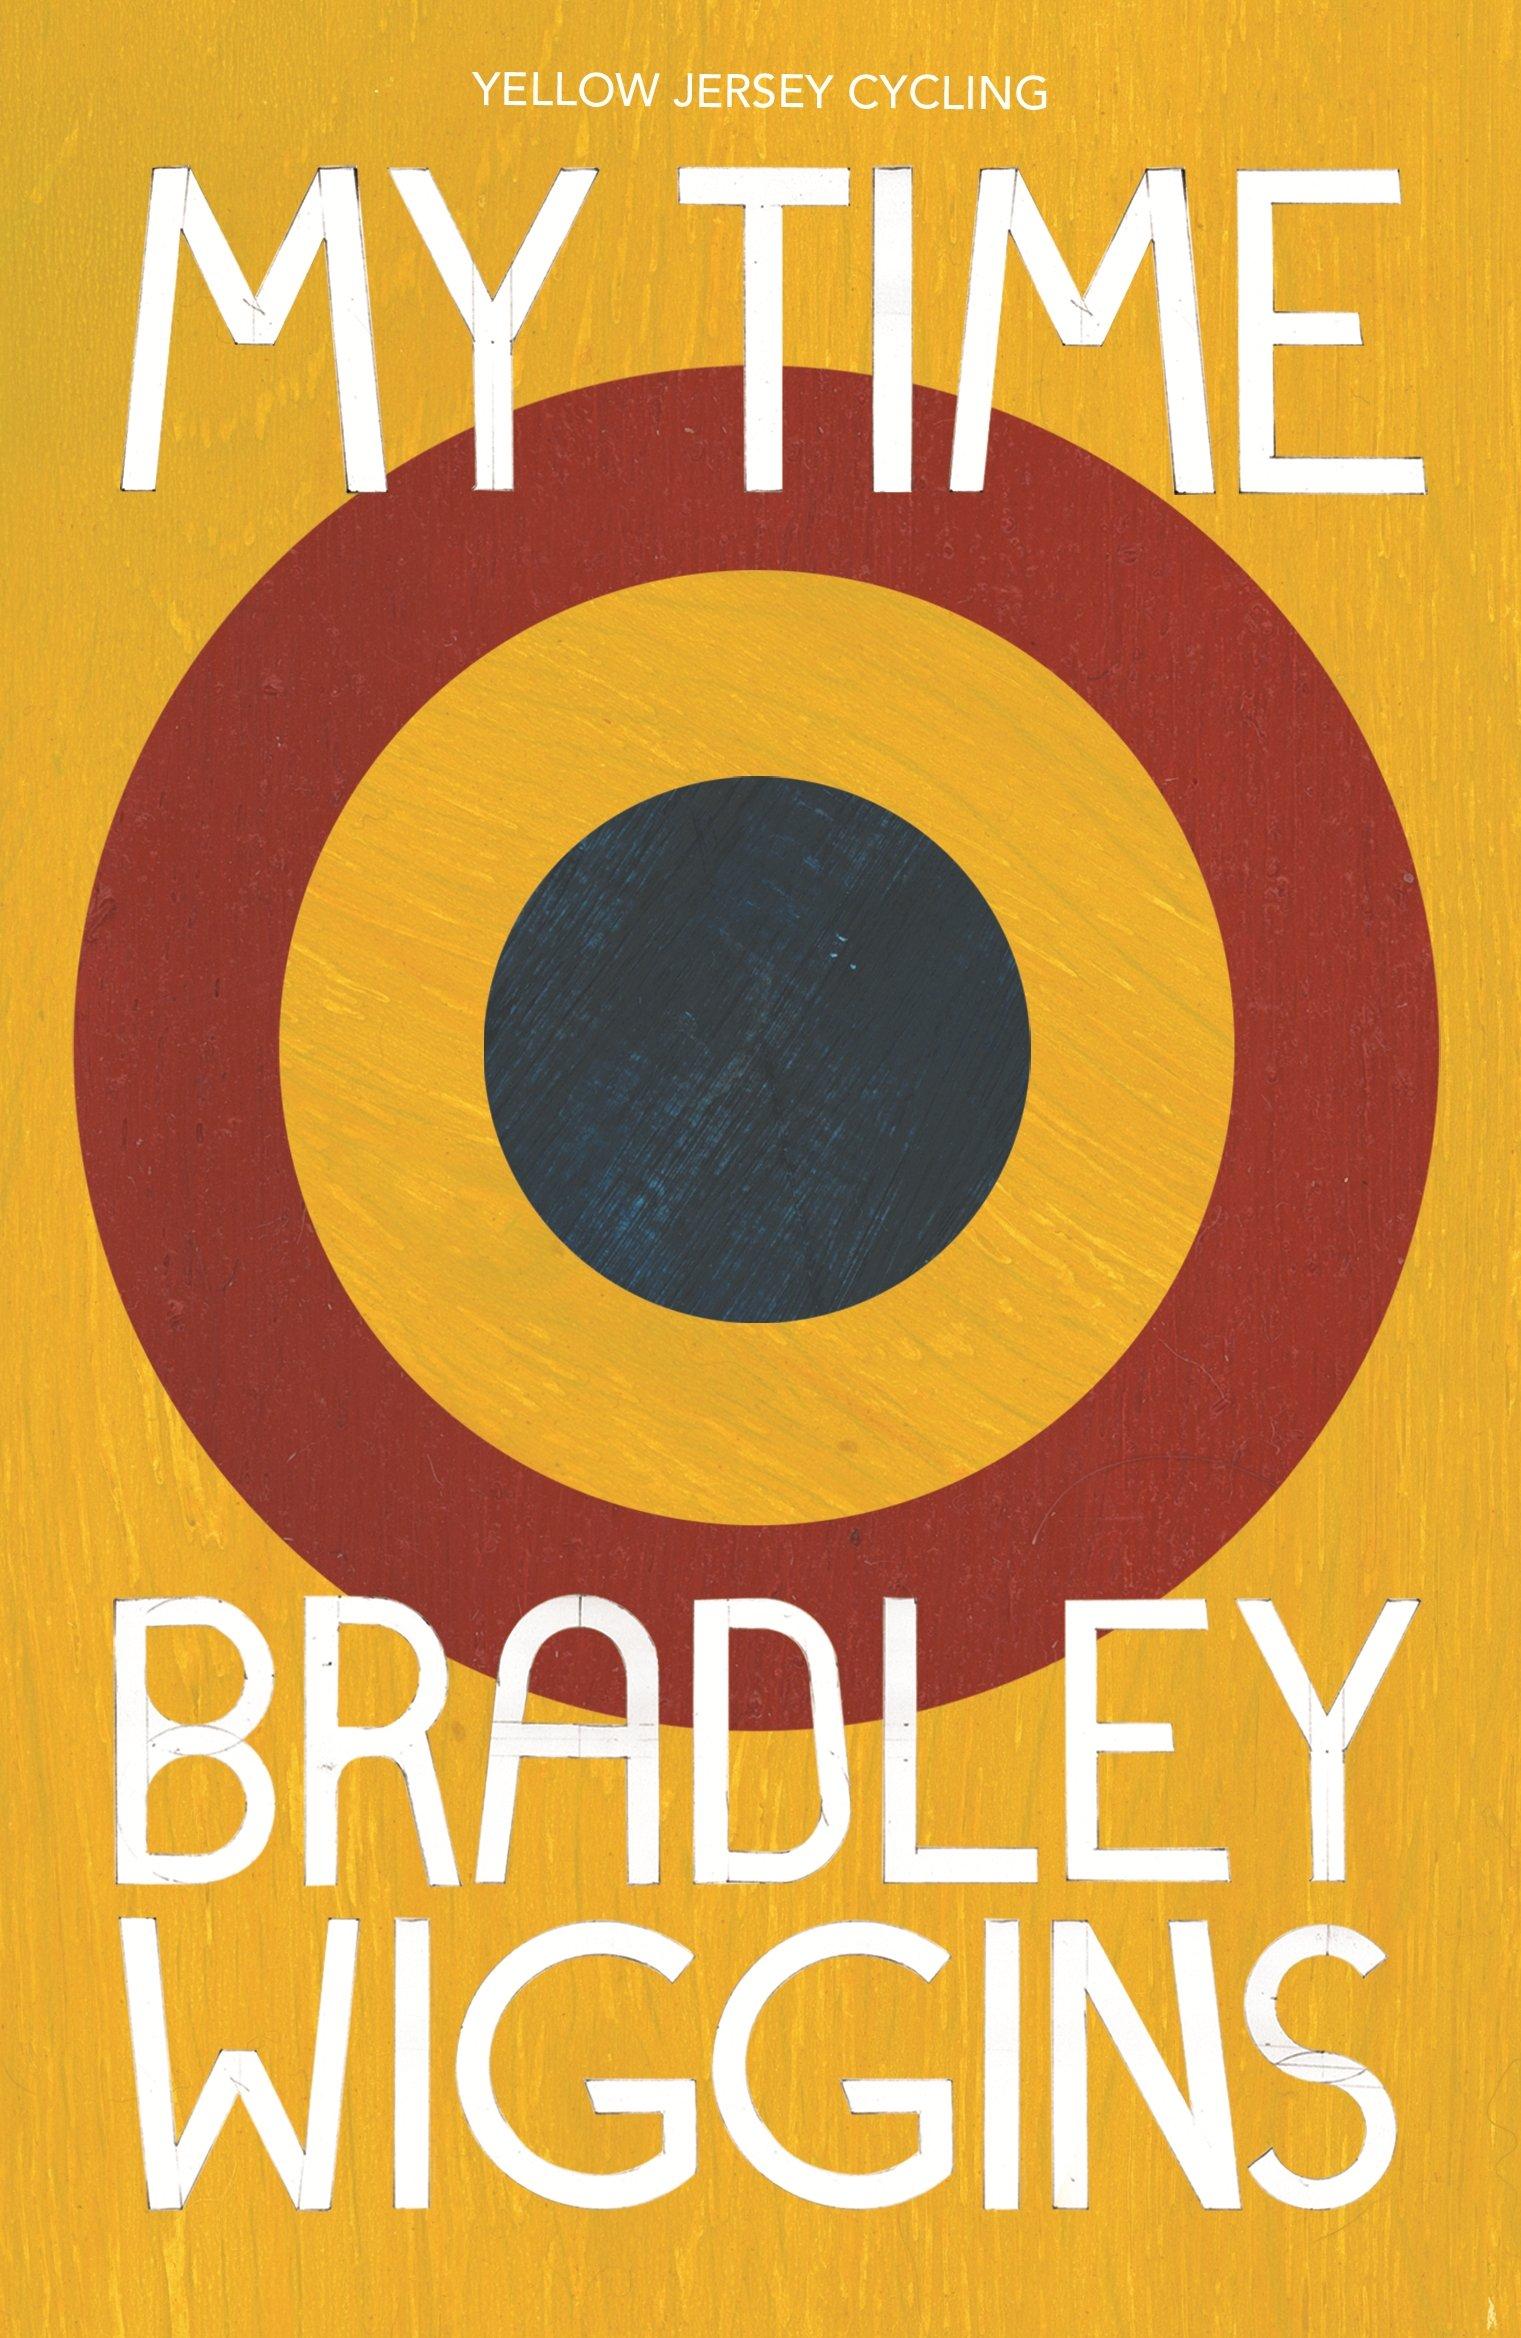 Bradley Wiggins  My Time  An Autobiography  Yellow Jersey Cycling Classics